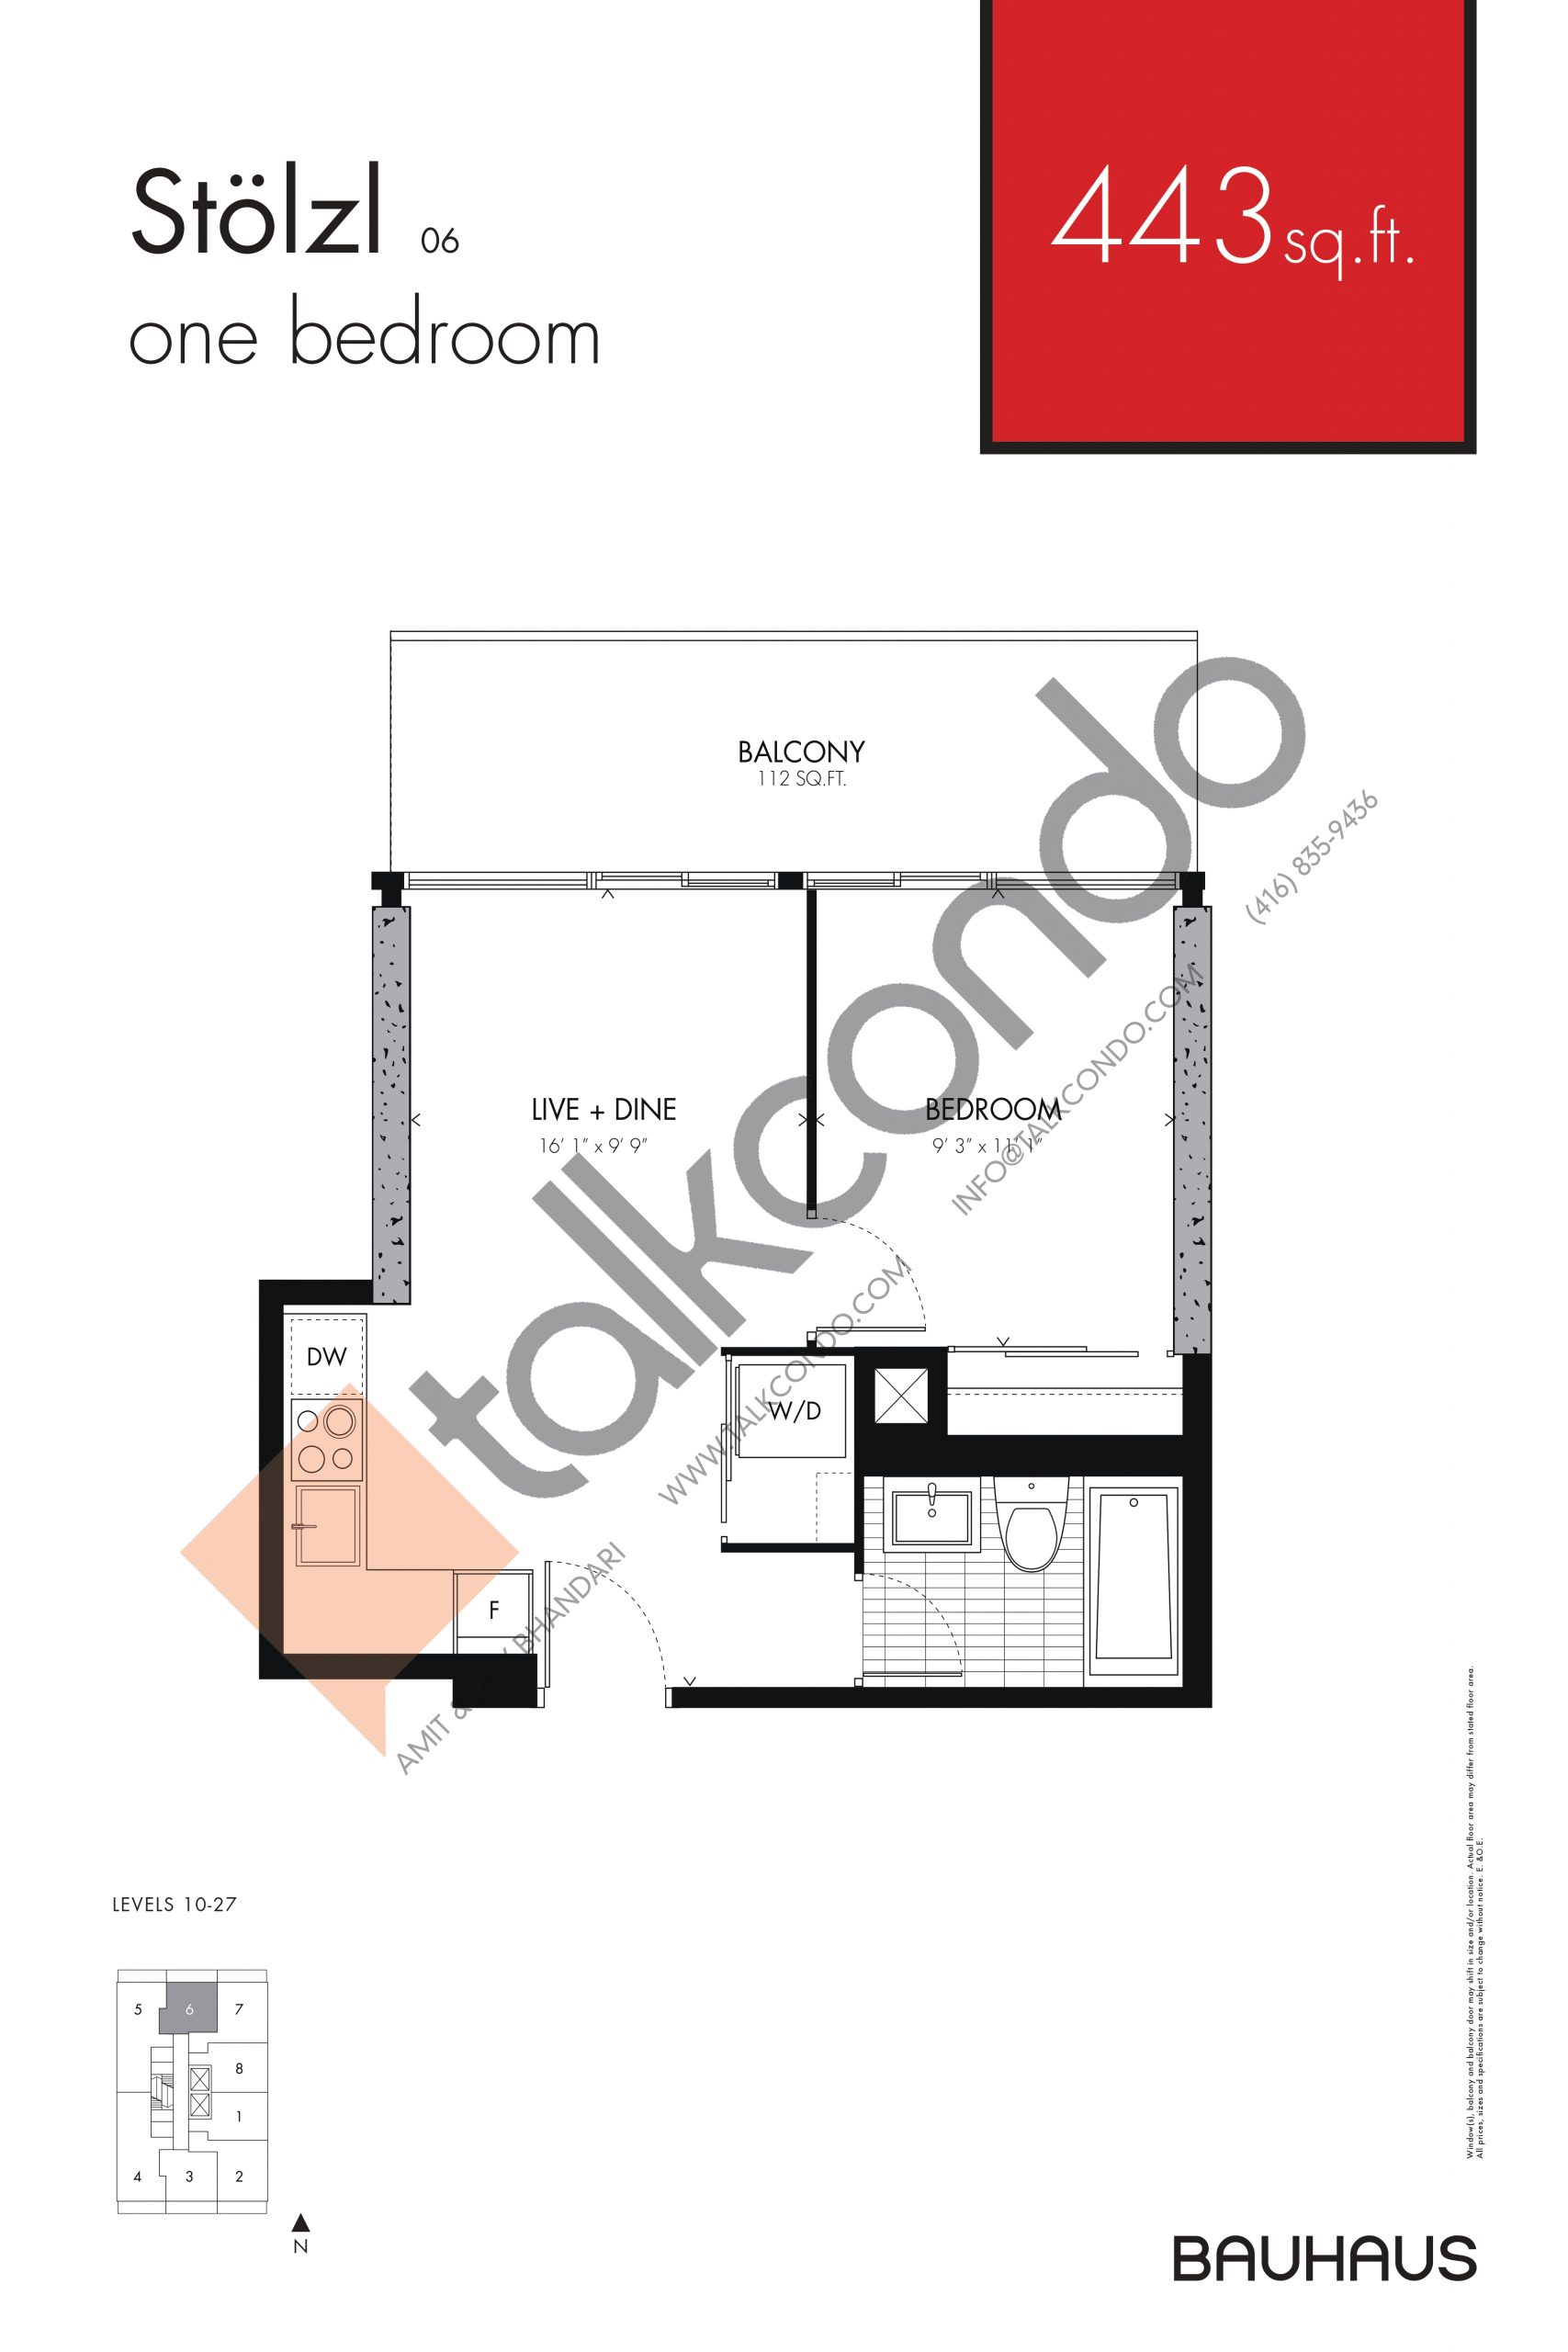 Stolzl Floor Plan at Bauhaus Condos - 443 sq.ft